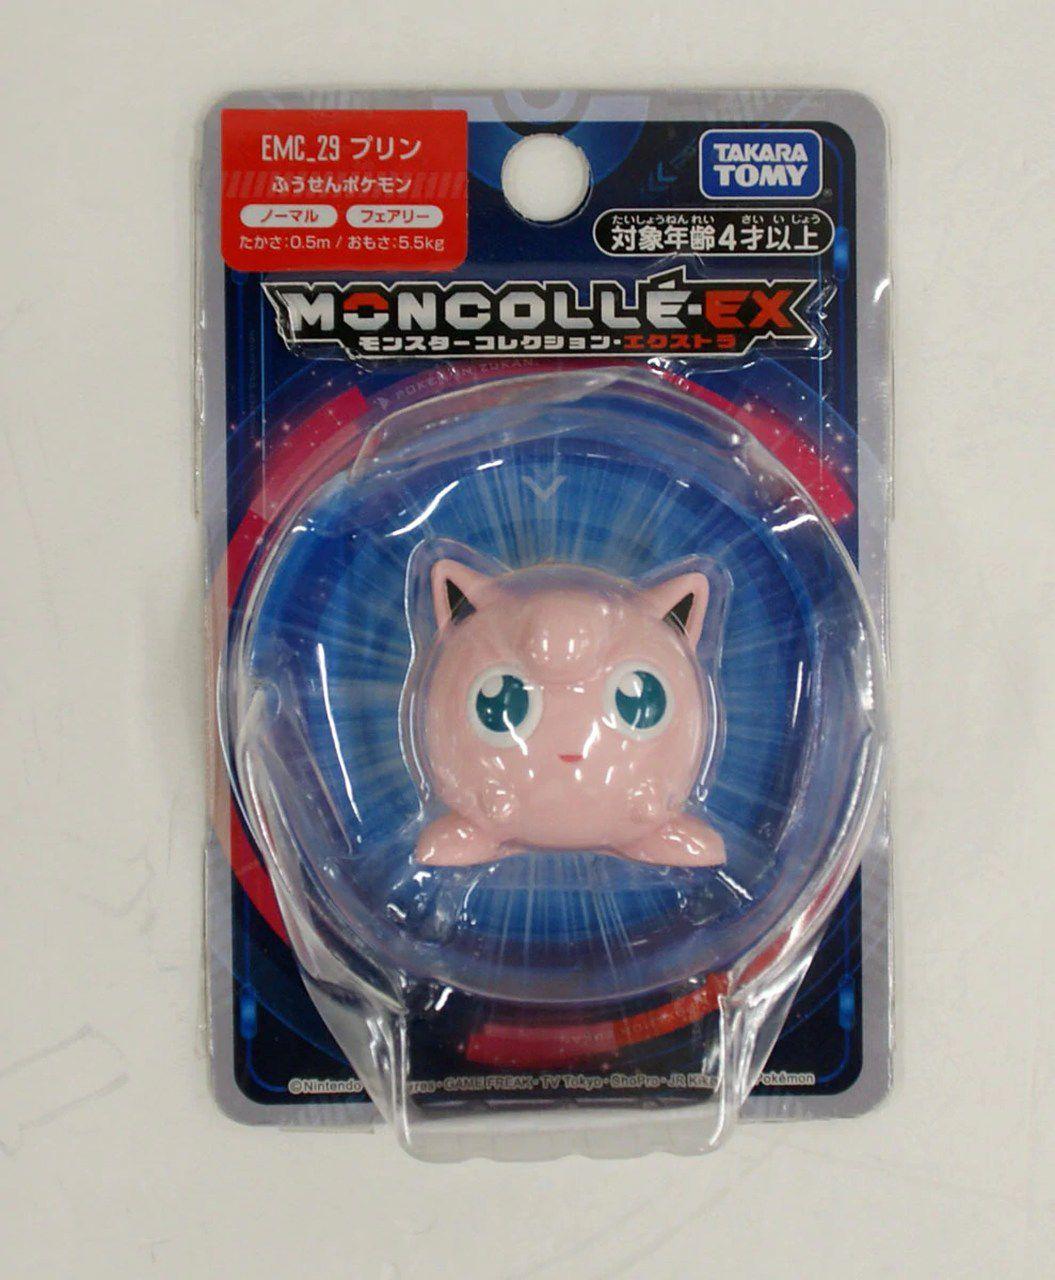 Pokemon - Jigglypuff Emc-29 - Xy Monster Collection - Takara Tomy